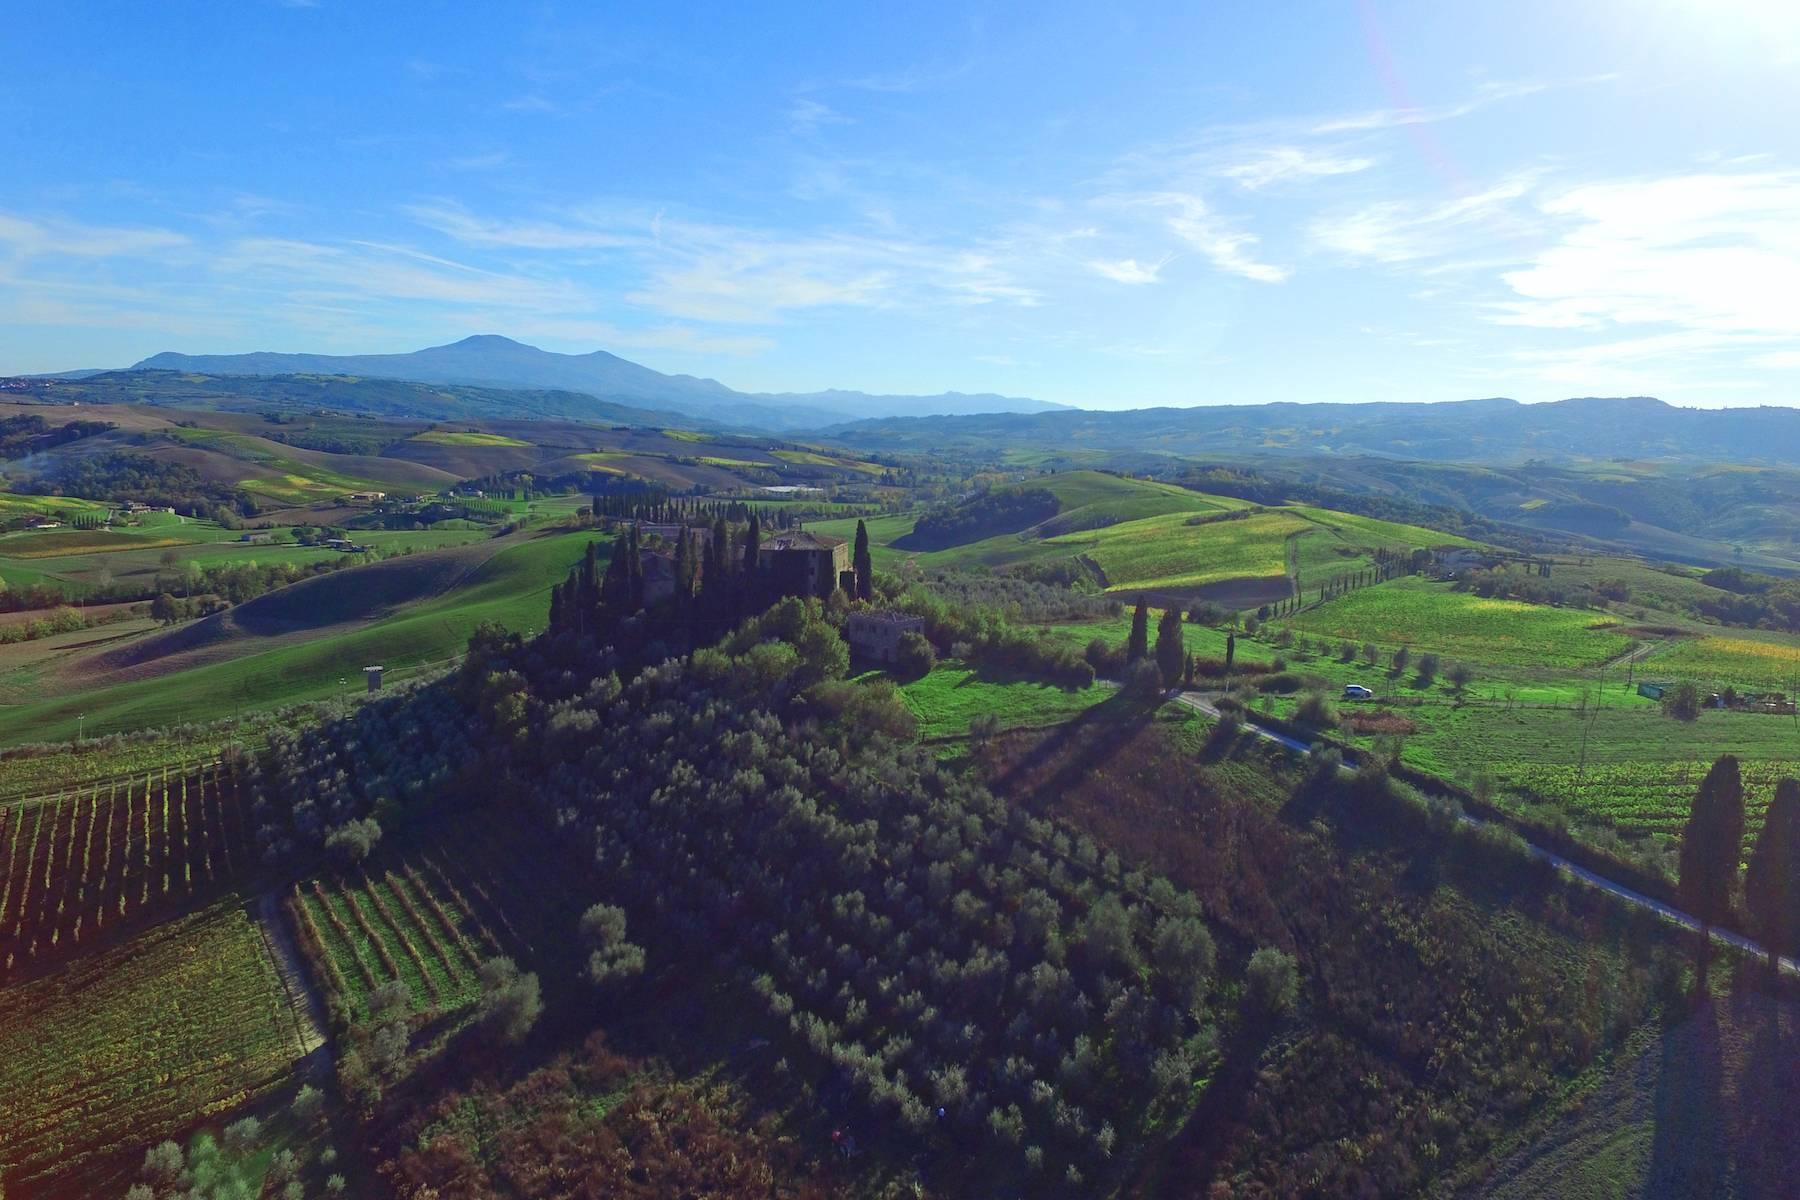 Wunderschönes Schloss im Herzen der Toskana - 11